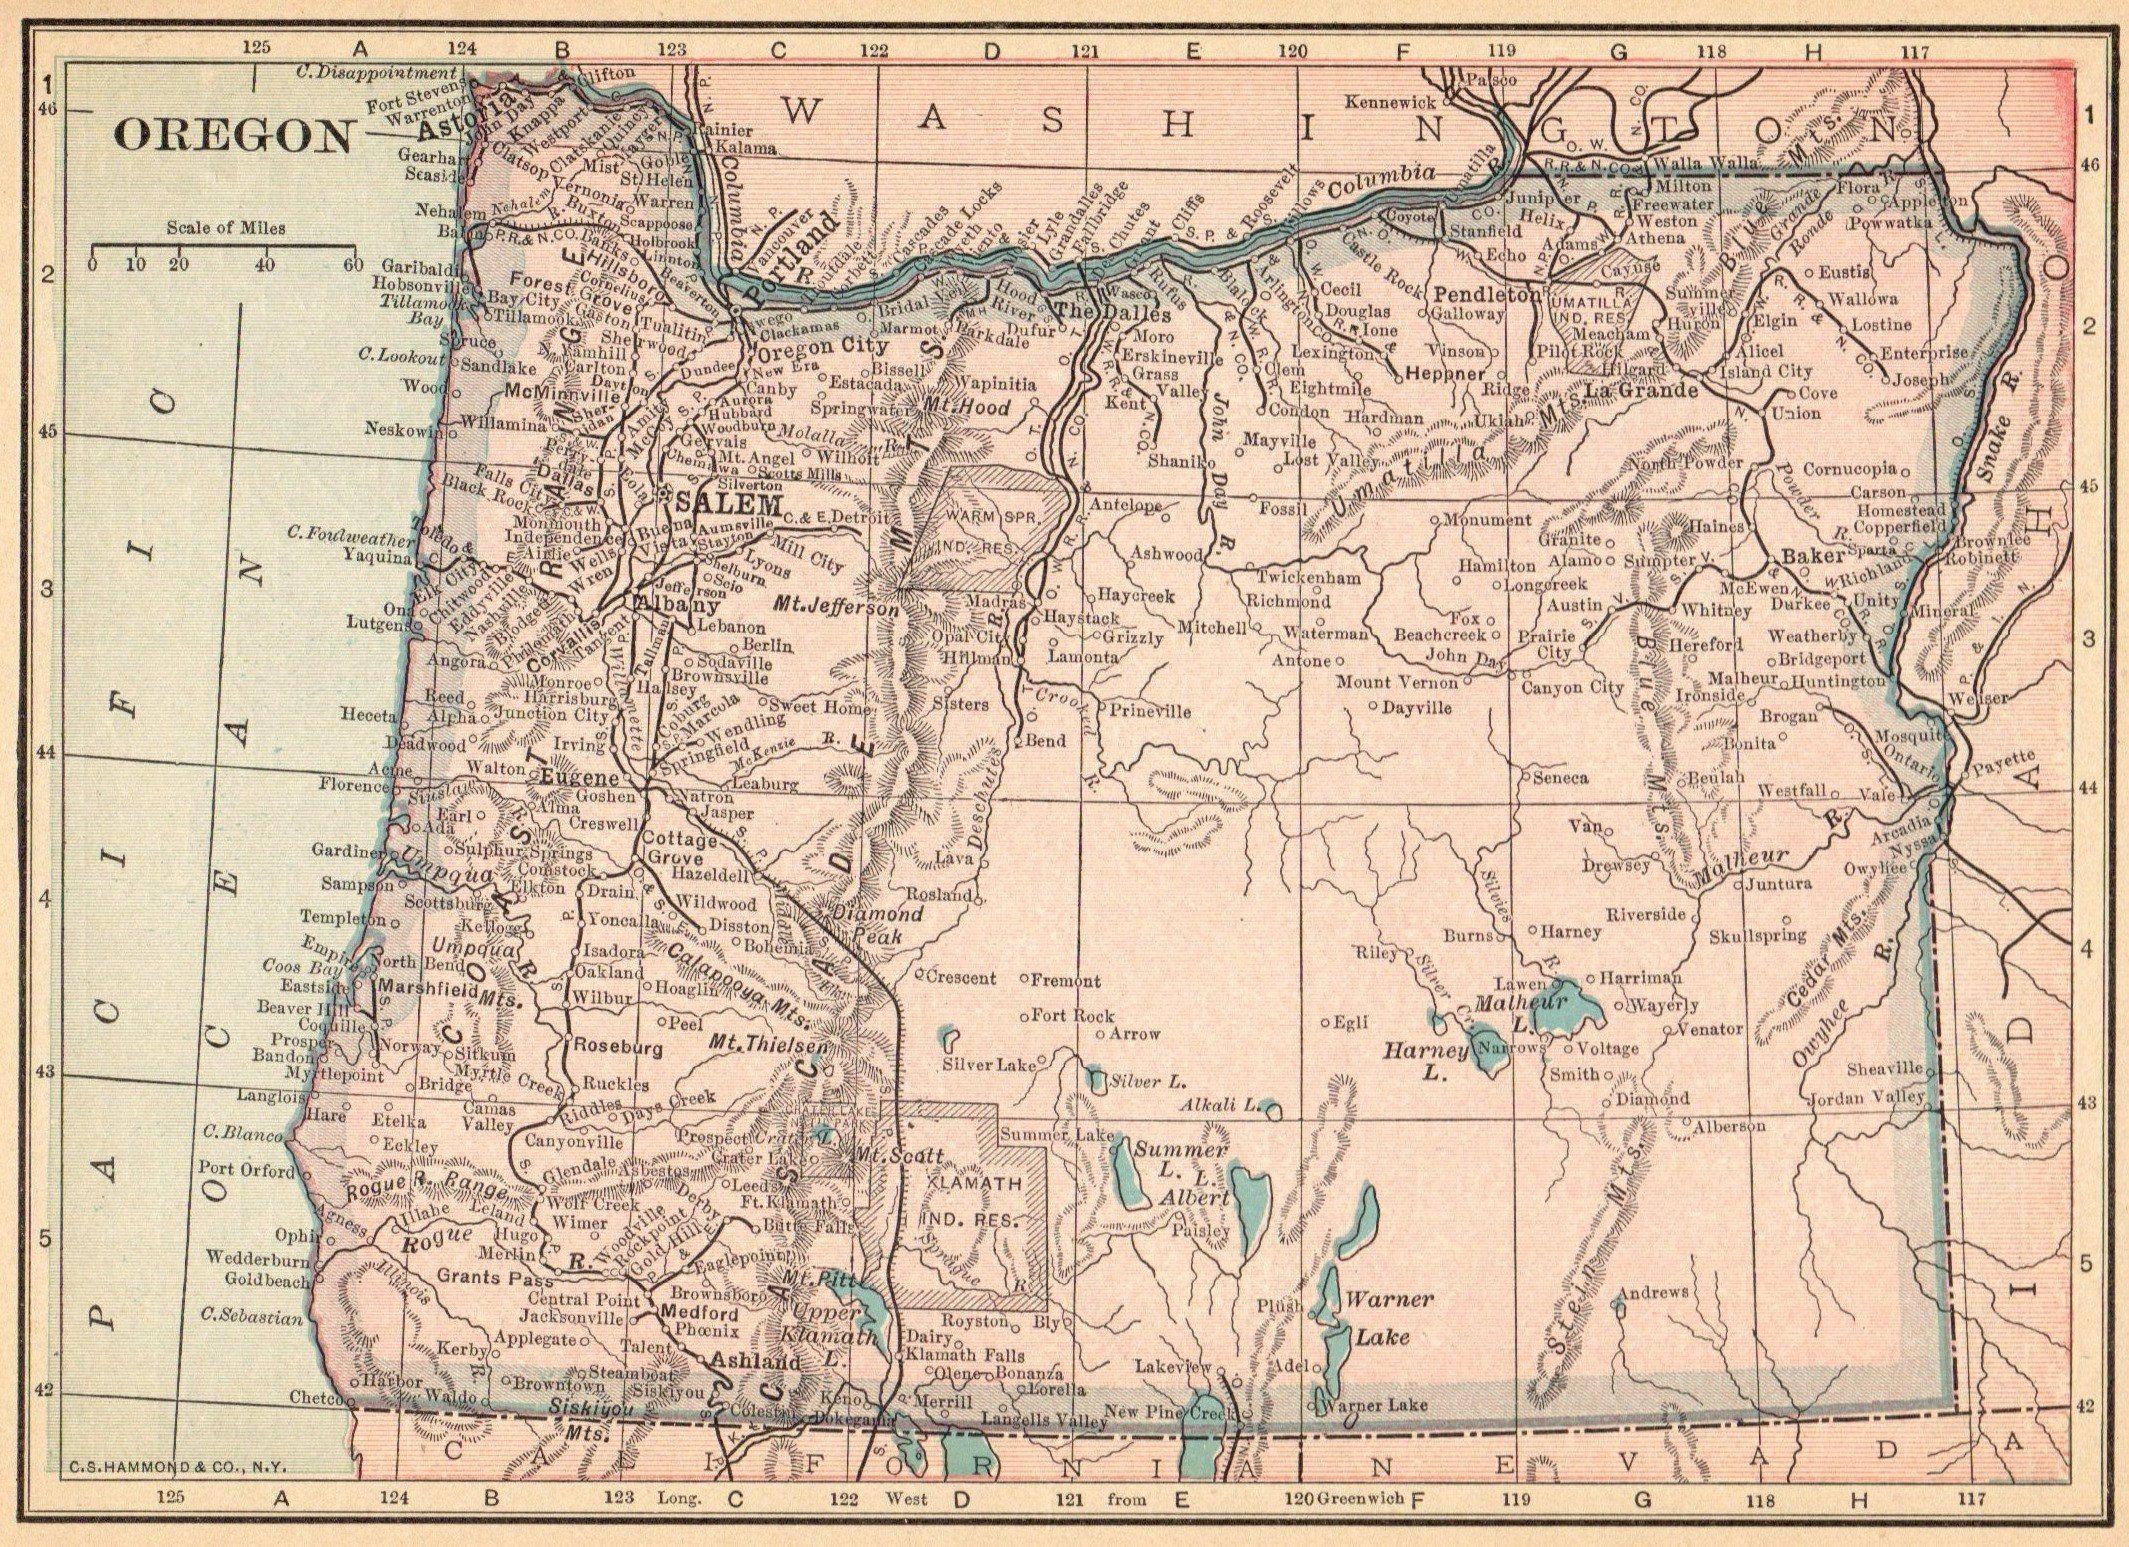 Vintage Oregon Map.1915 Antique Oregon State Map Vintage Map Of Oregon Gallery Wall Art